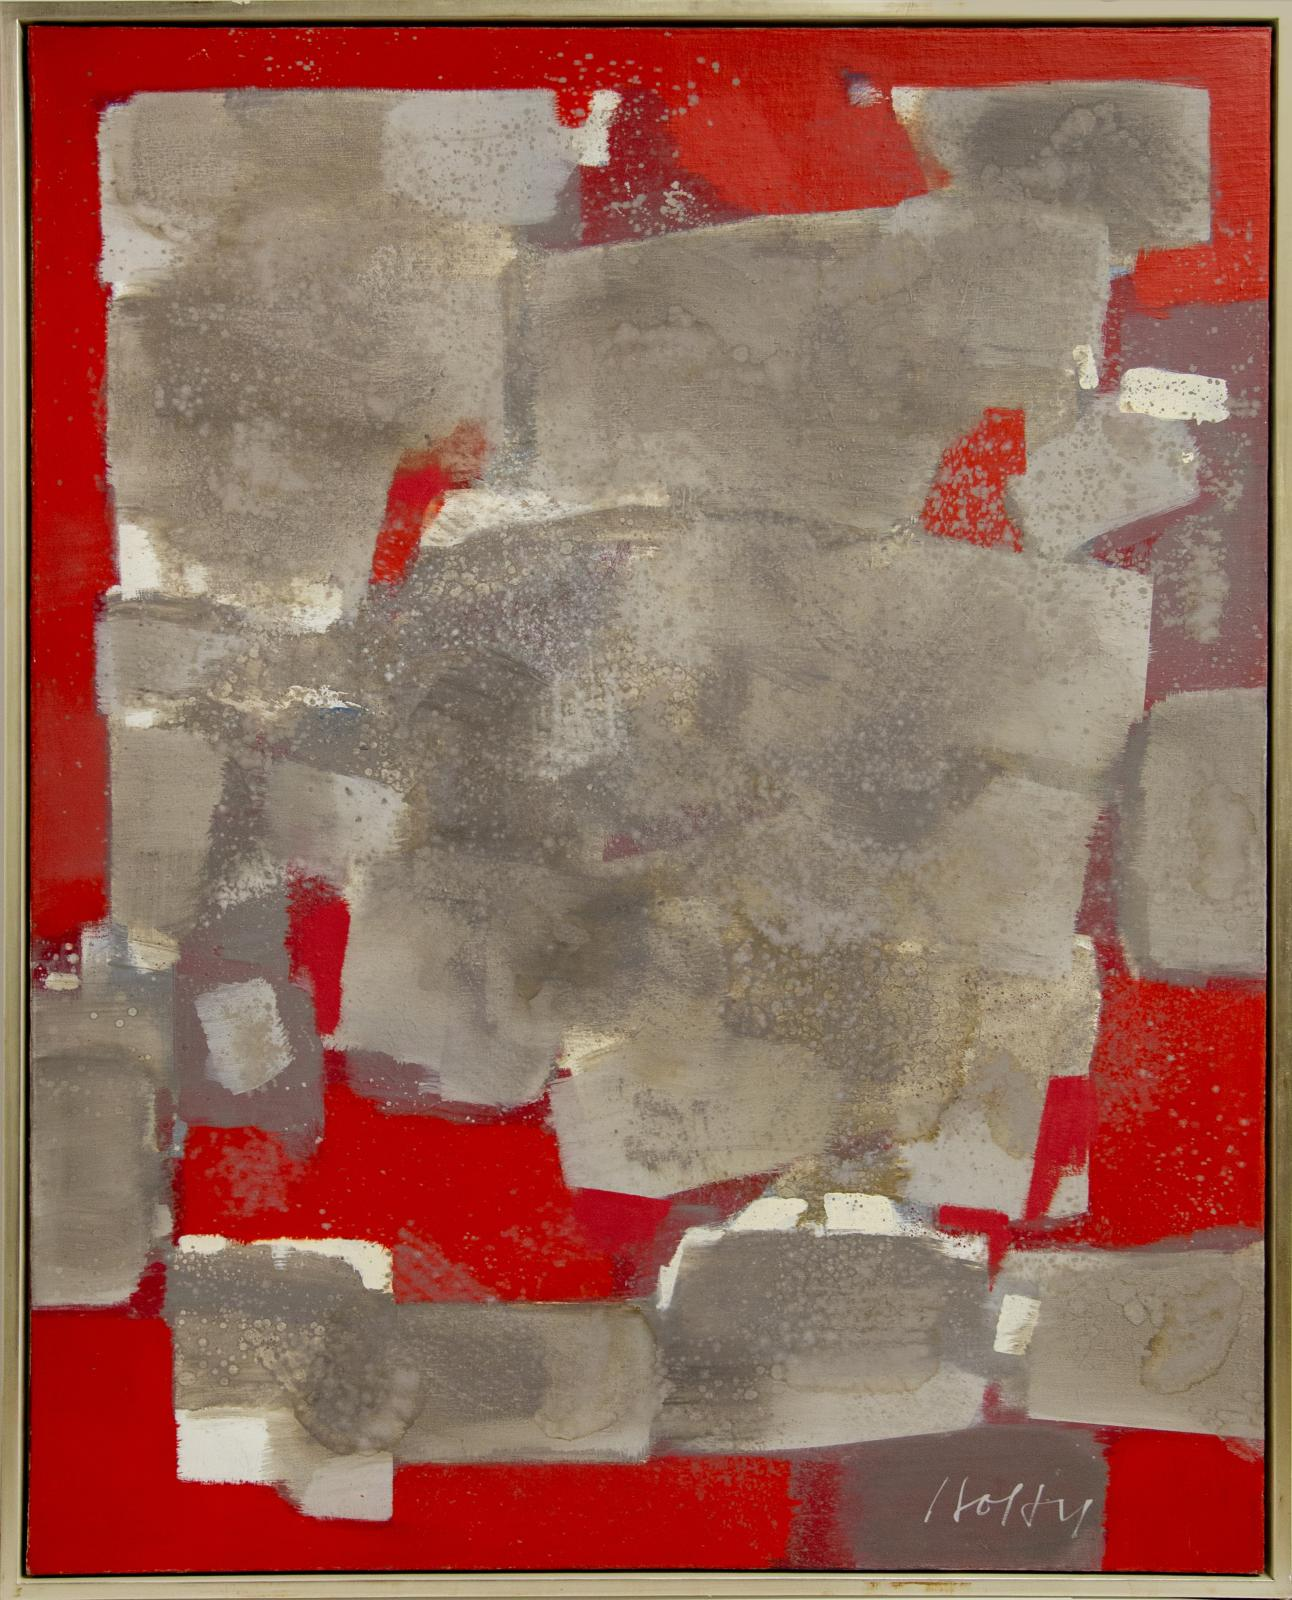 Gray Volume in Red